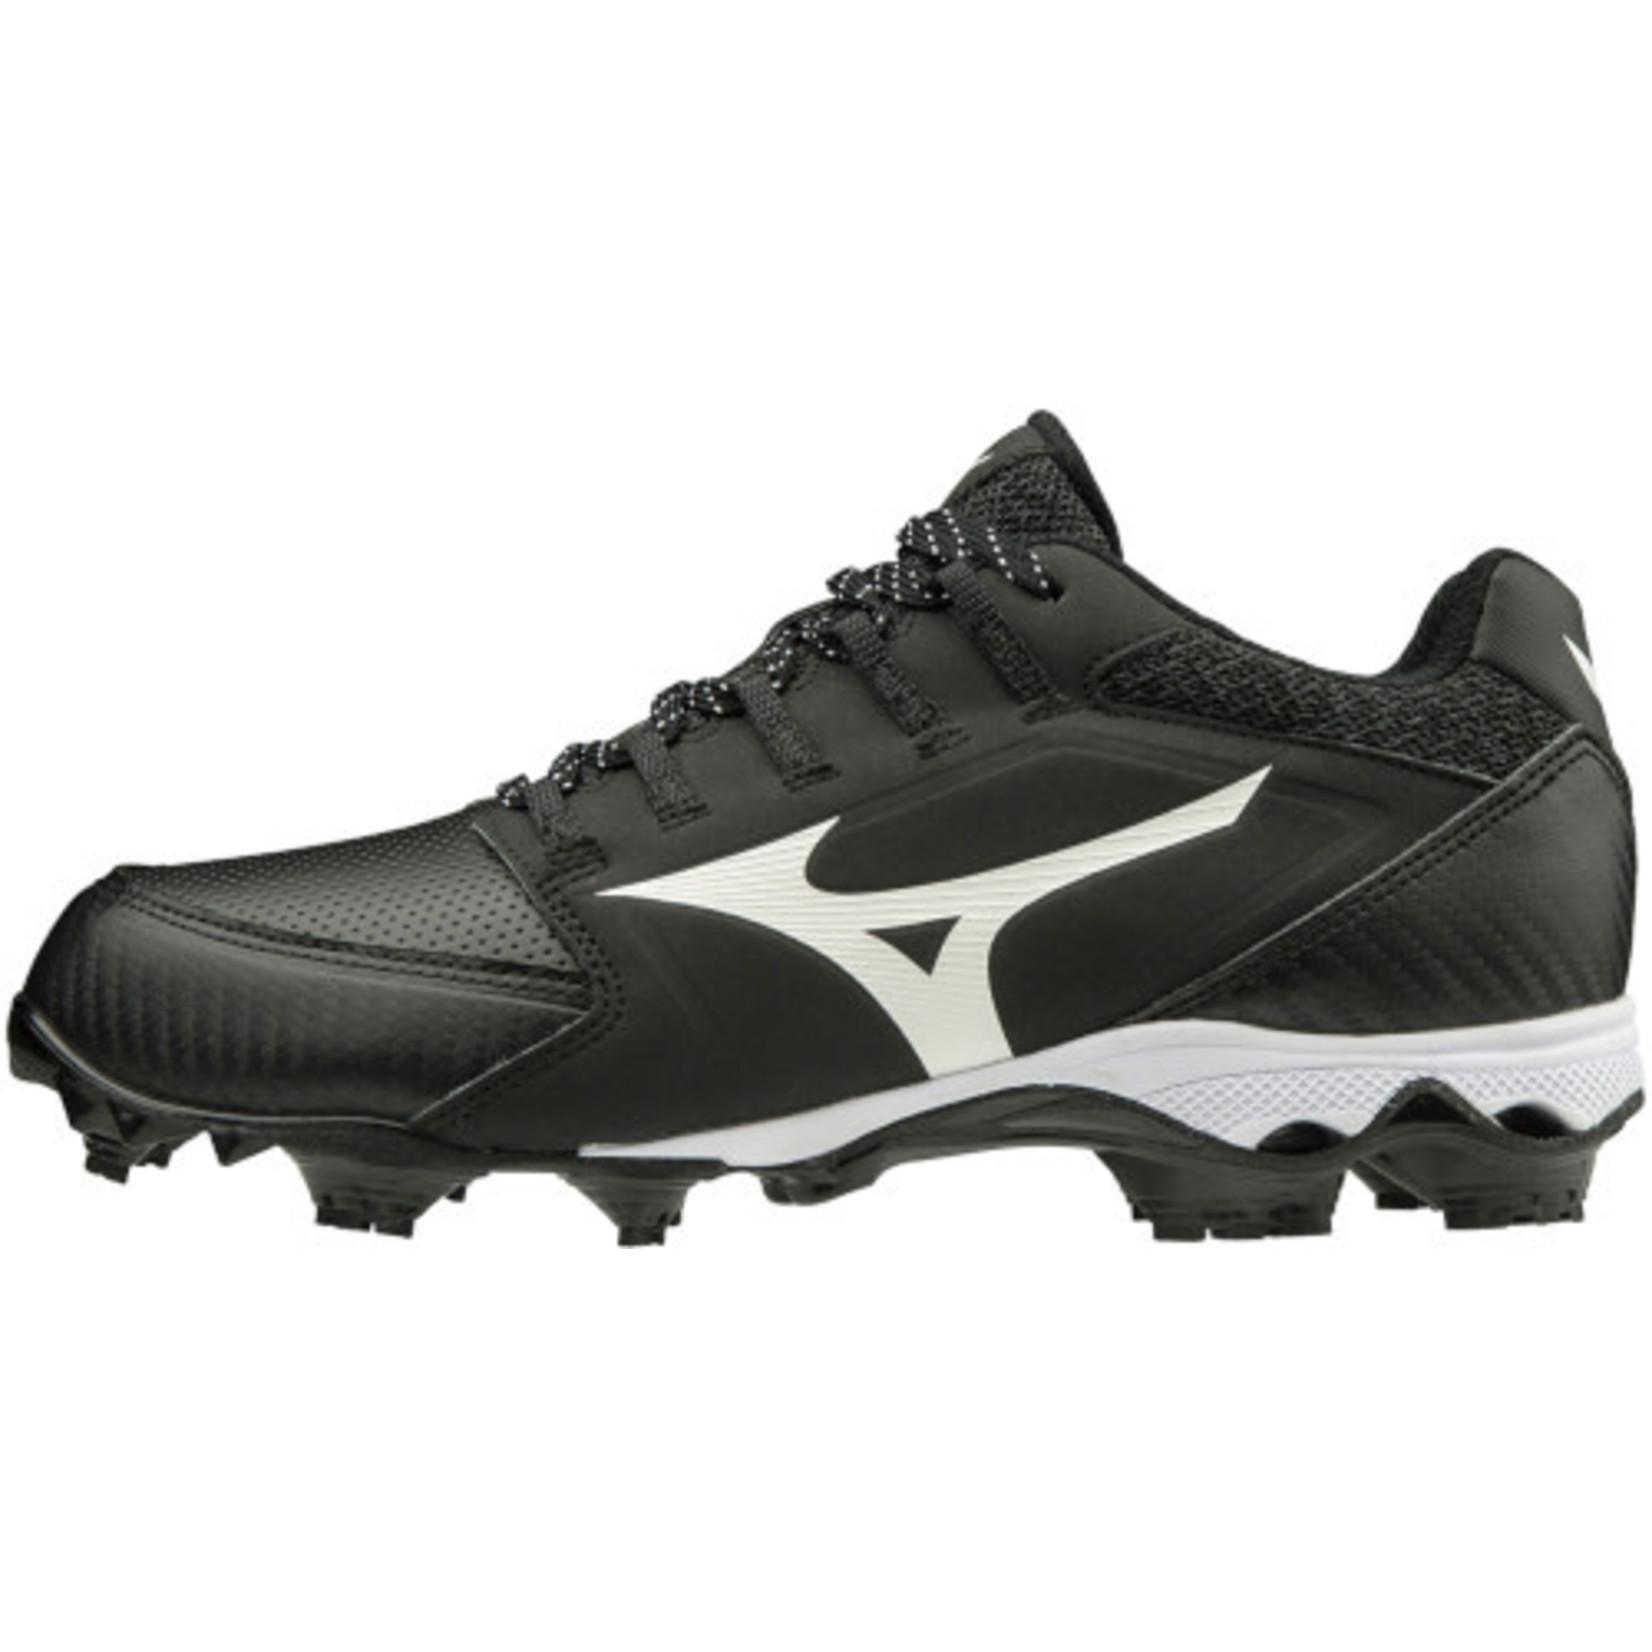 Mizuno Mizuno Baseball Shoes, 9-Spike Advanced Finch Elite 4, TPU, Ladies